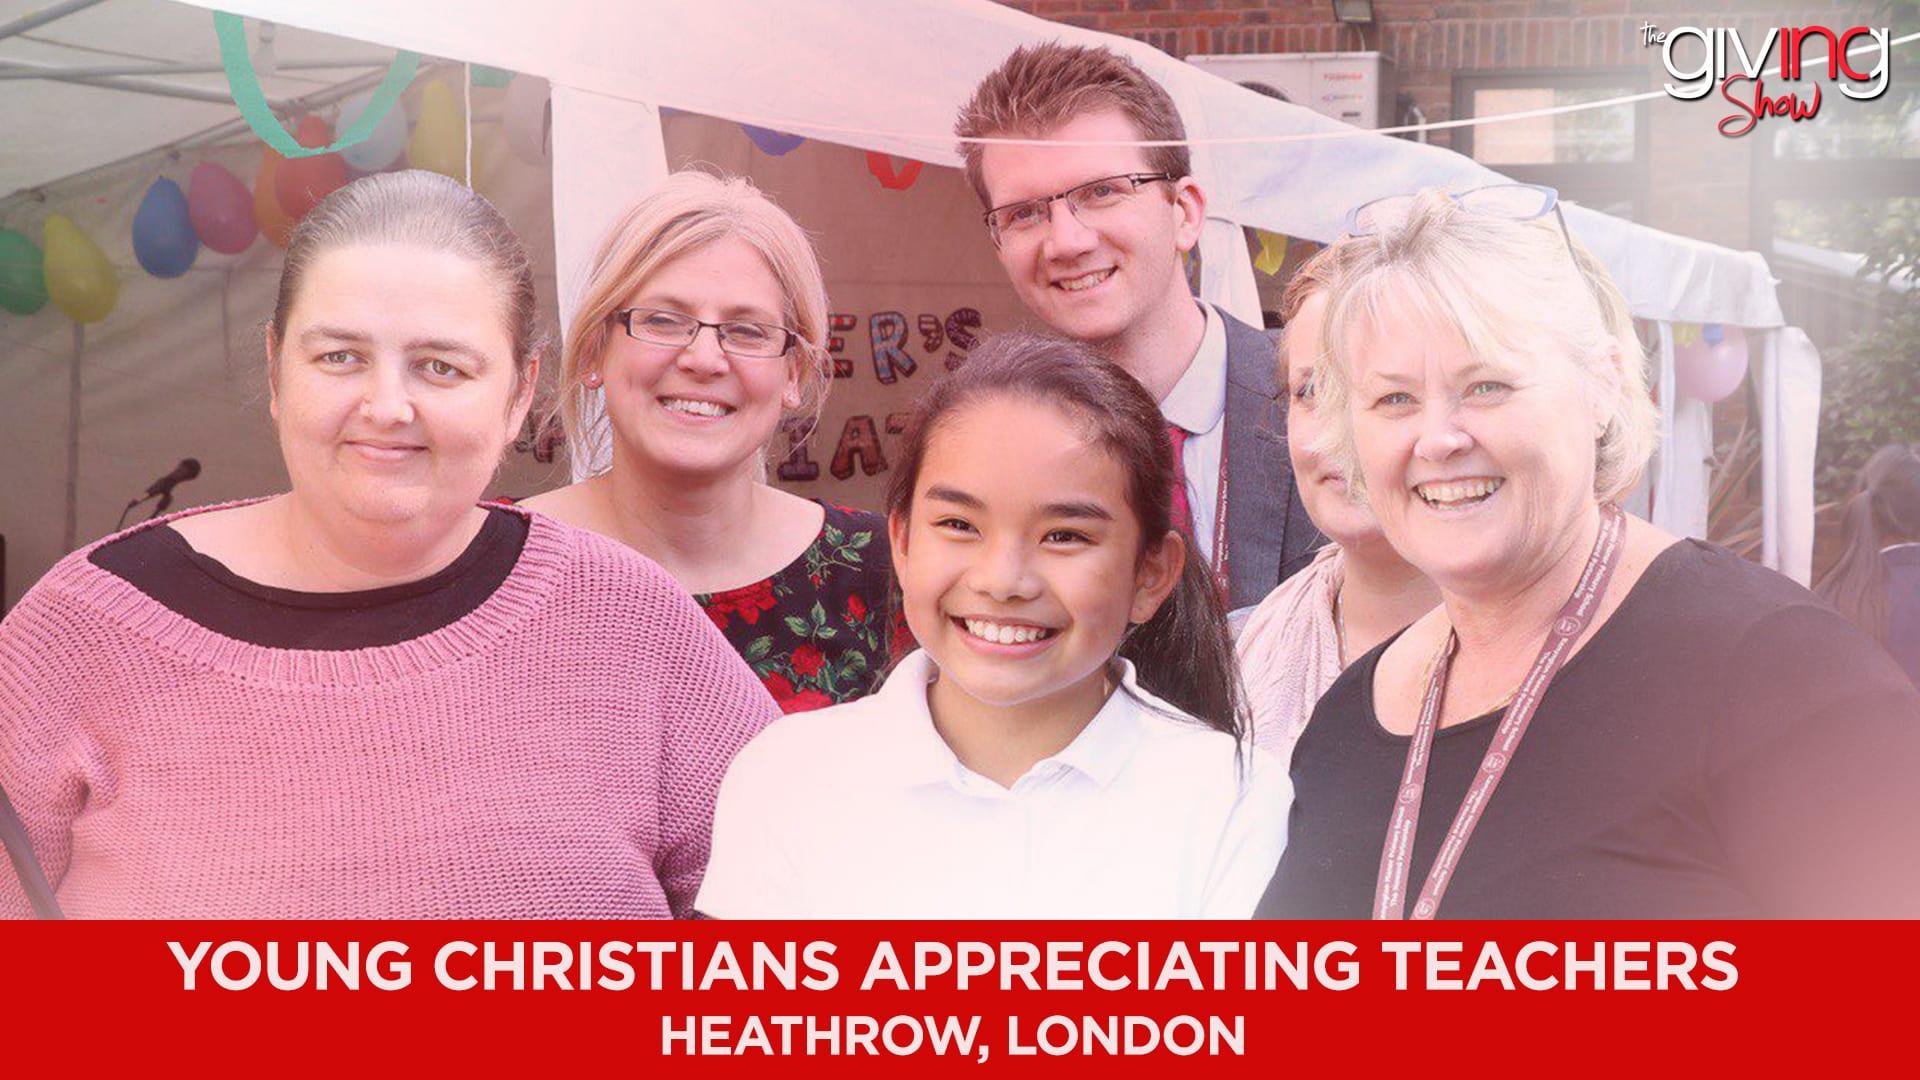 Young Christians Appreciating Teachers